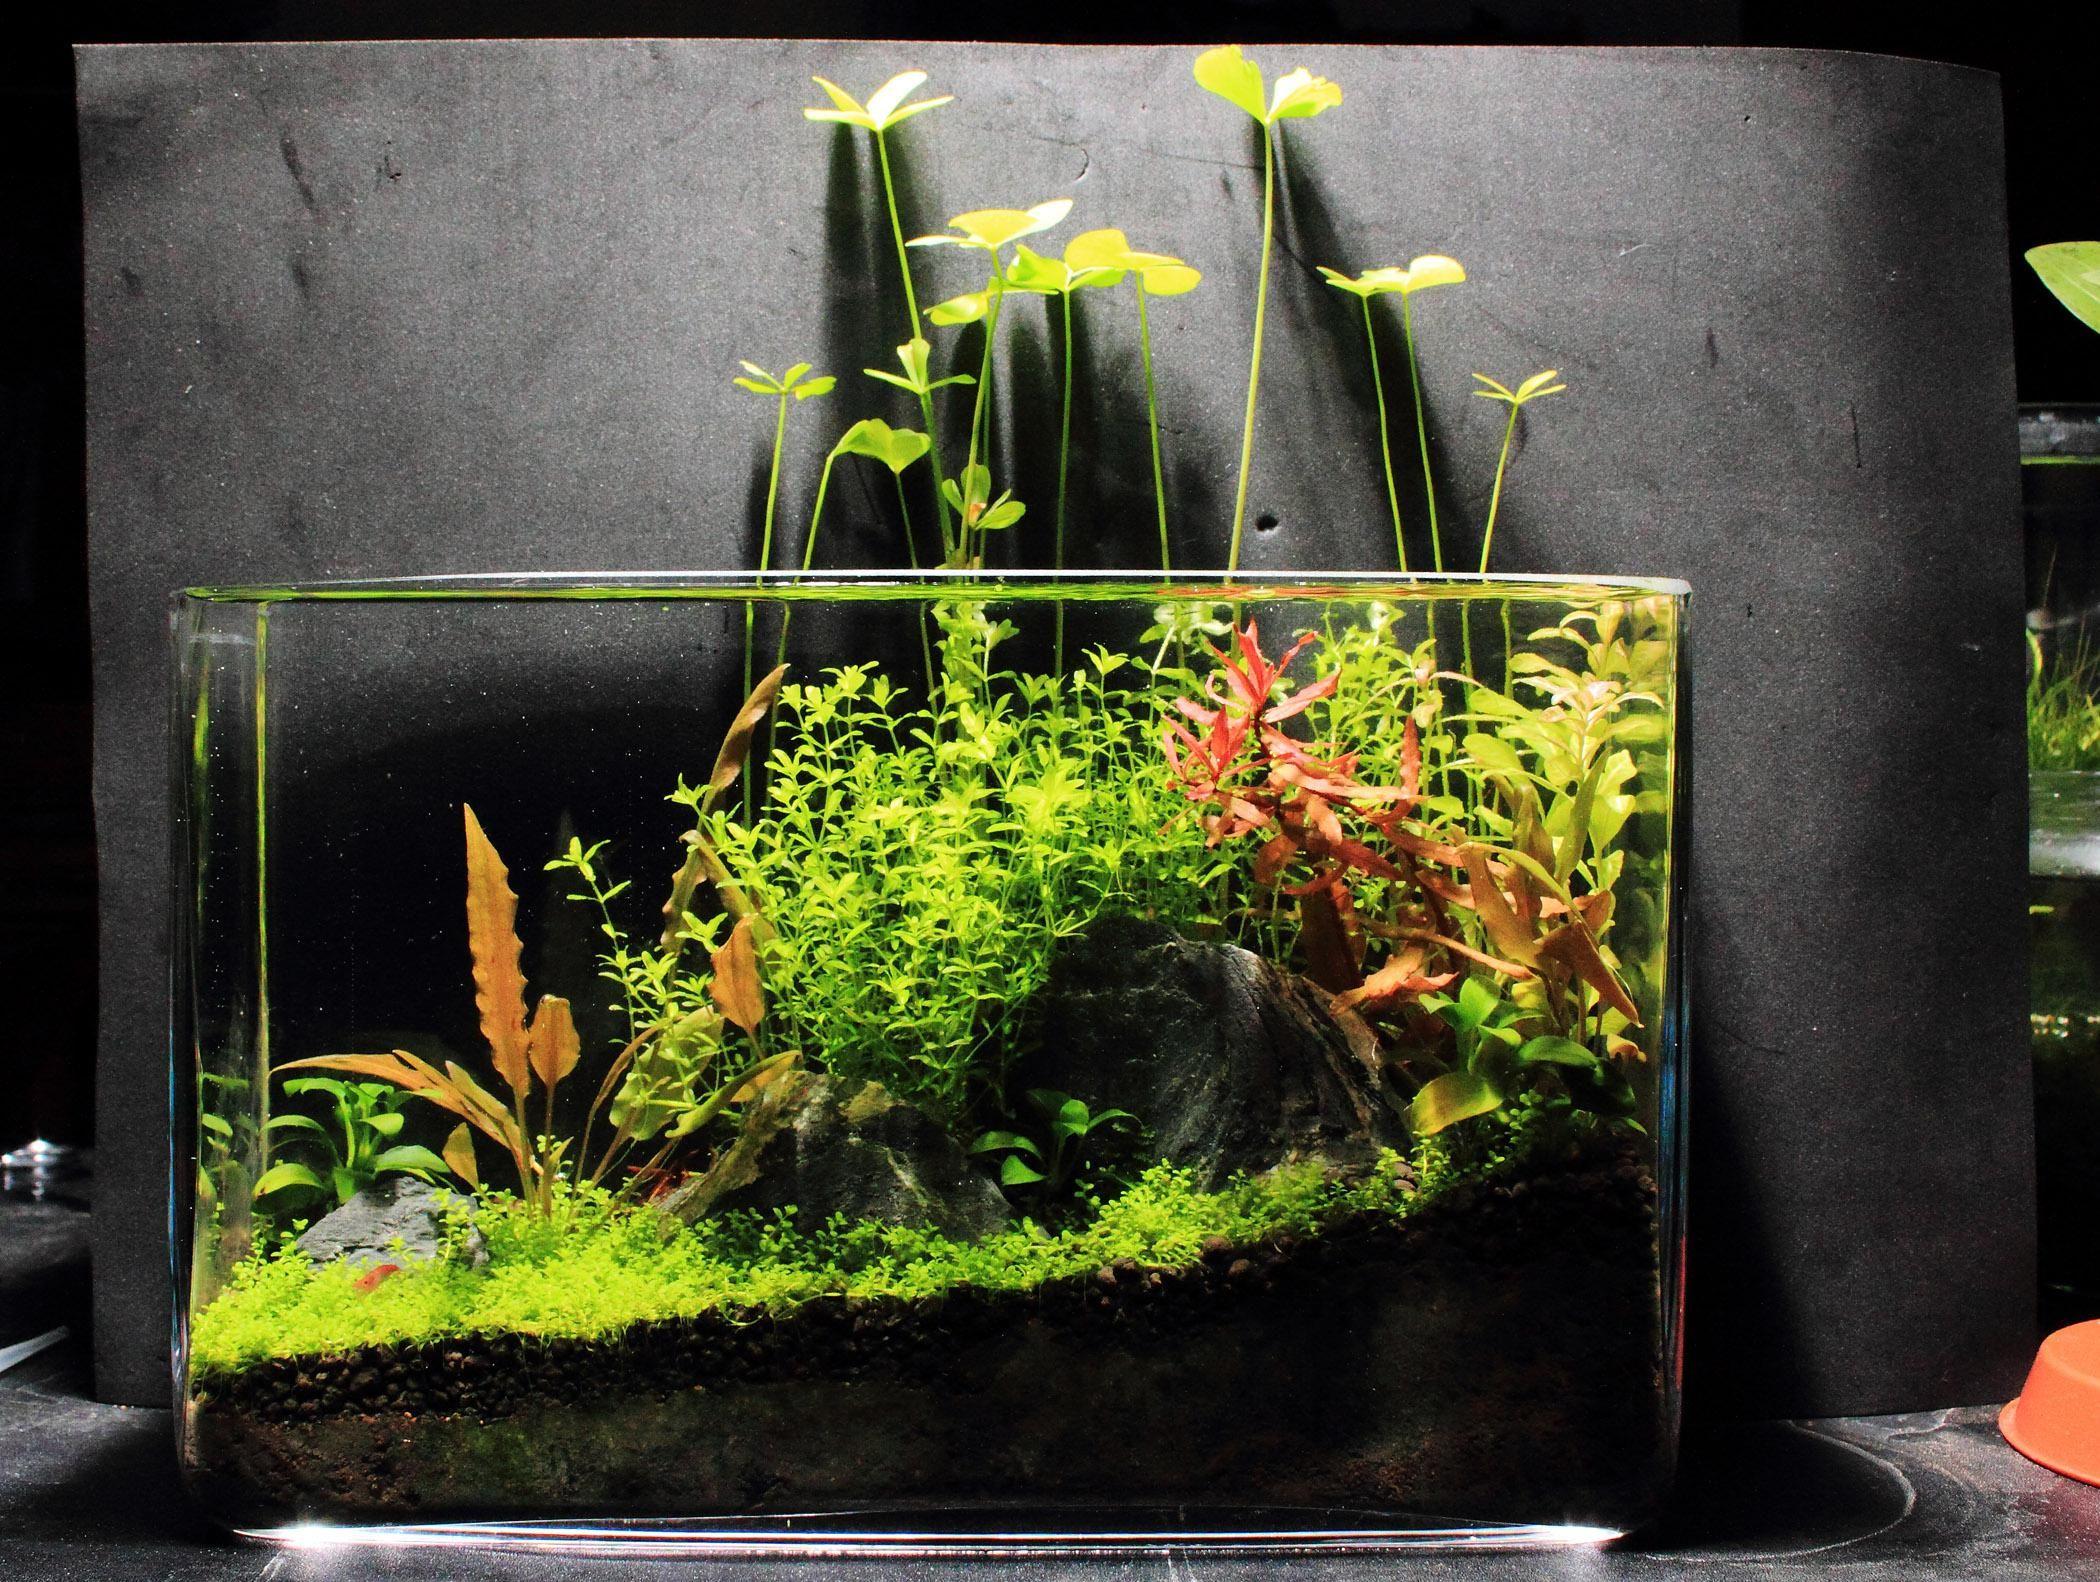 xz 39 s 3ft high tech low tech nano experiments the planted tank forum dutch style. Black Bedroom Furniture Sets. Home Design Ideas